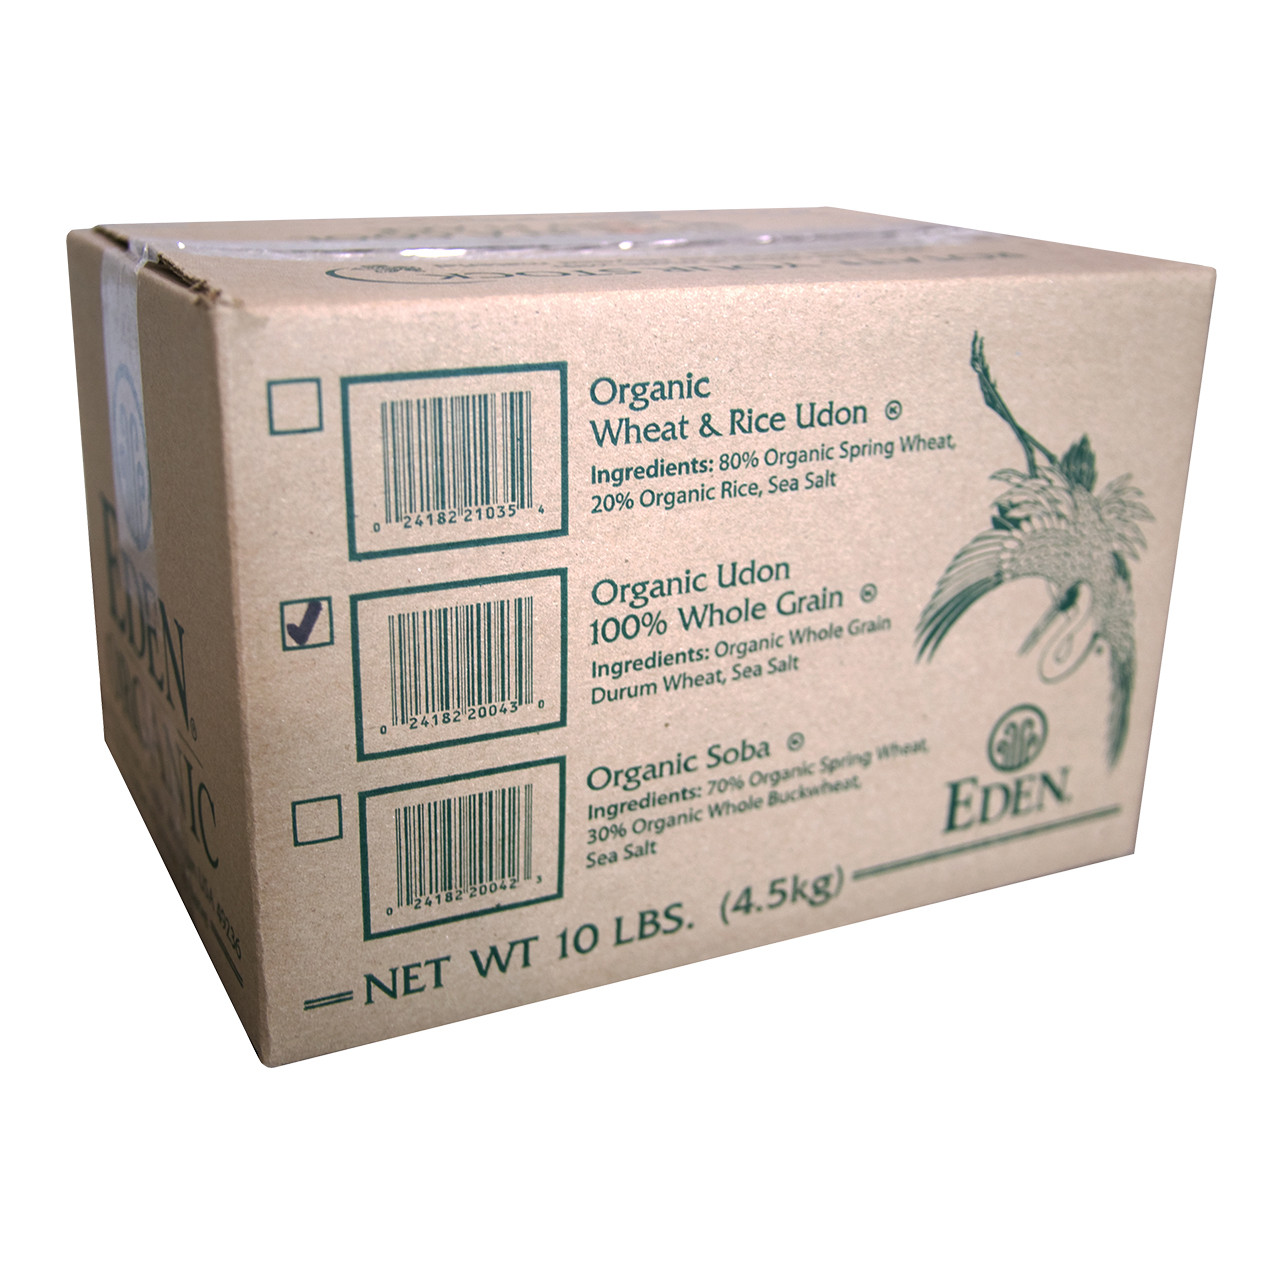 Udon, Organic, 100% Whole Grain - 10 lb